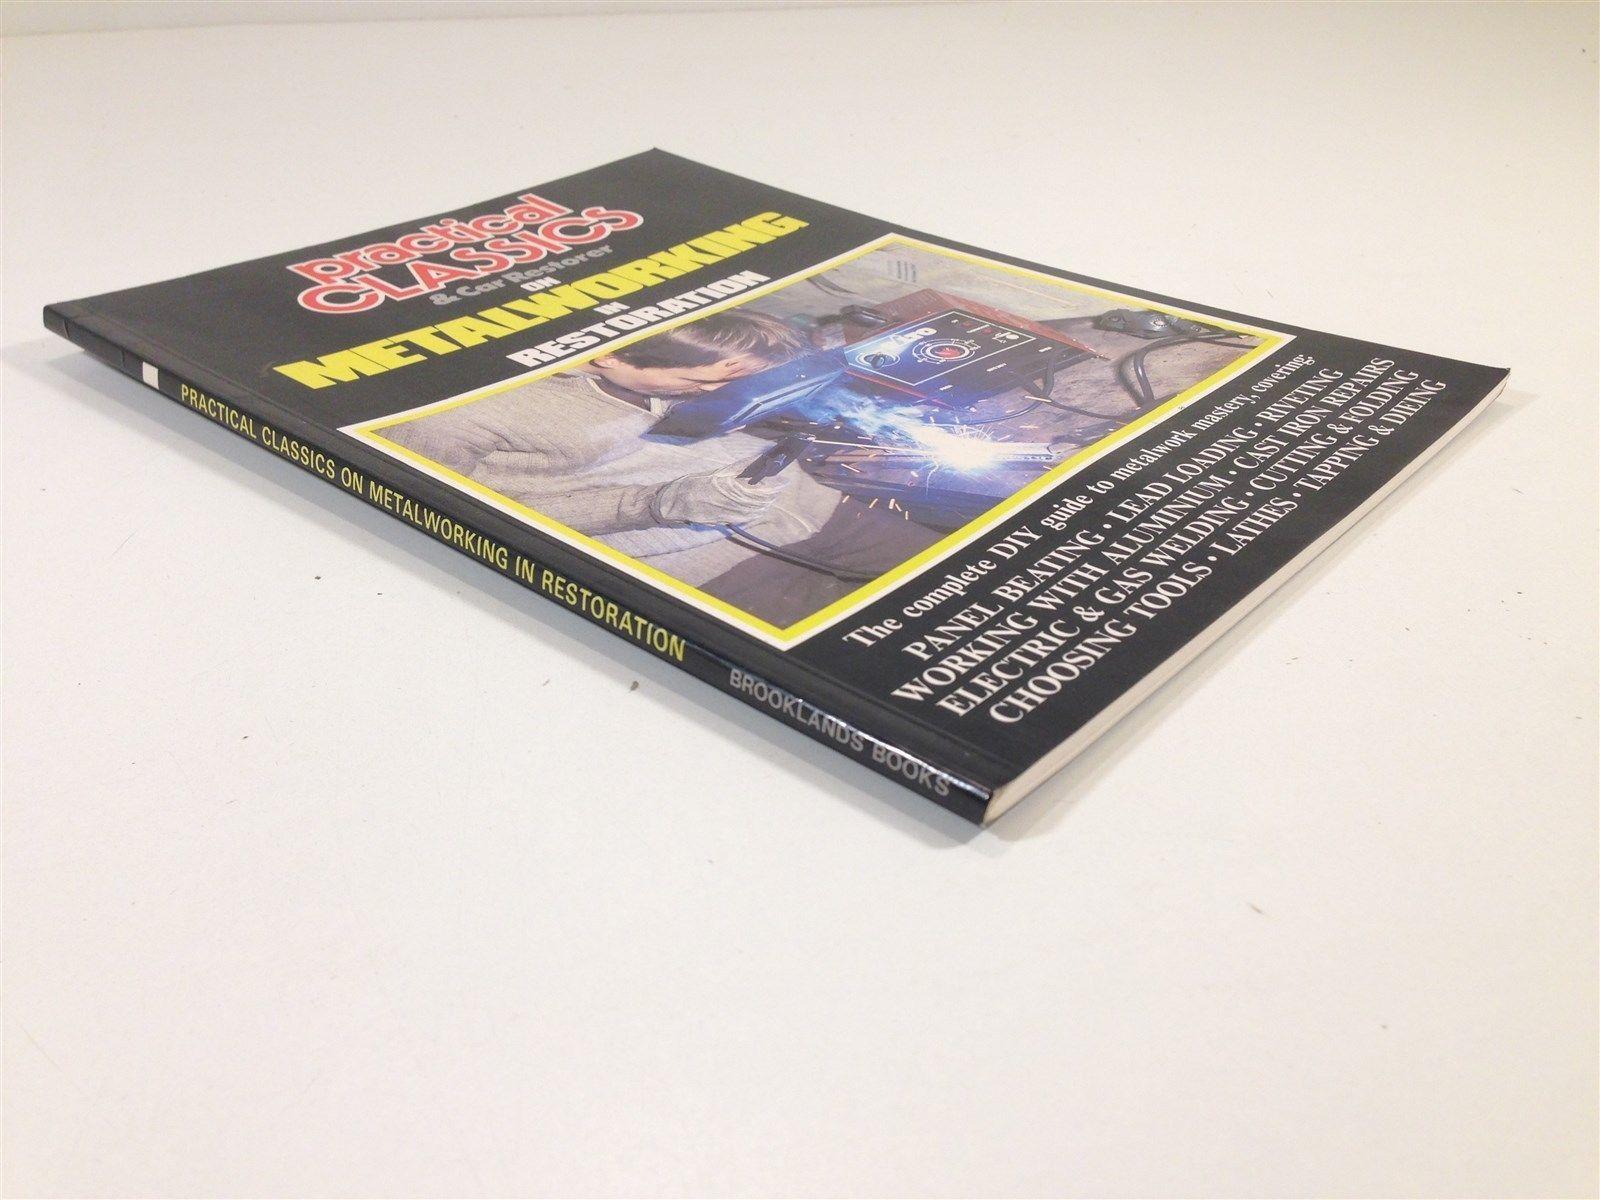 Practical Classics & Car Restorer on Metalworking in Restoration